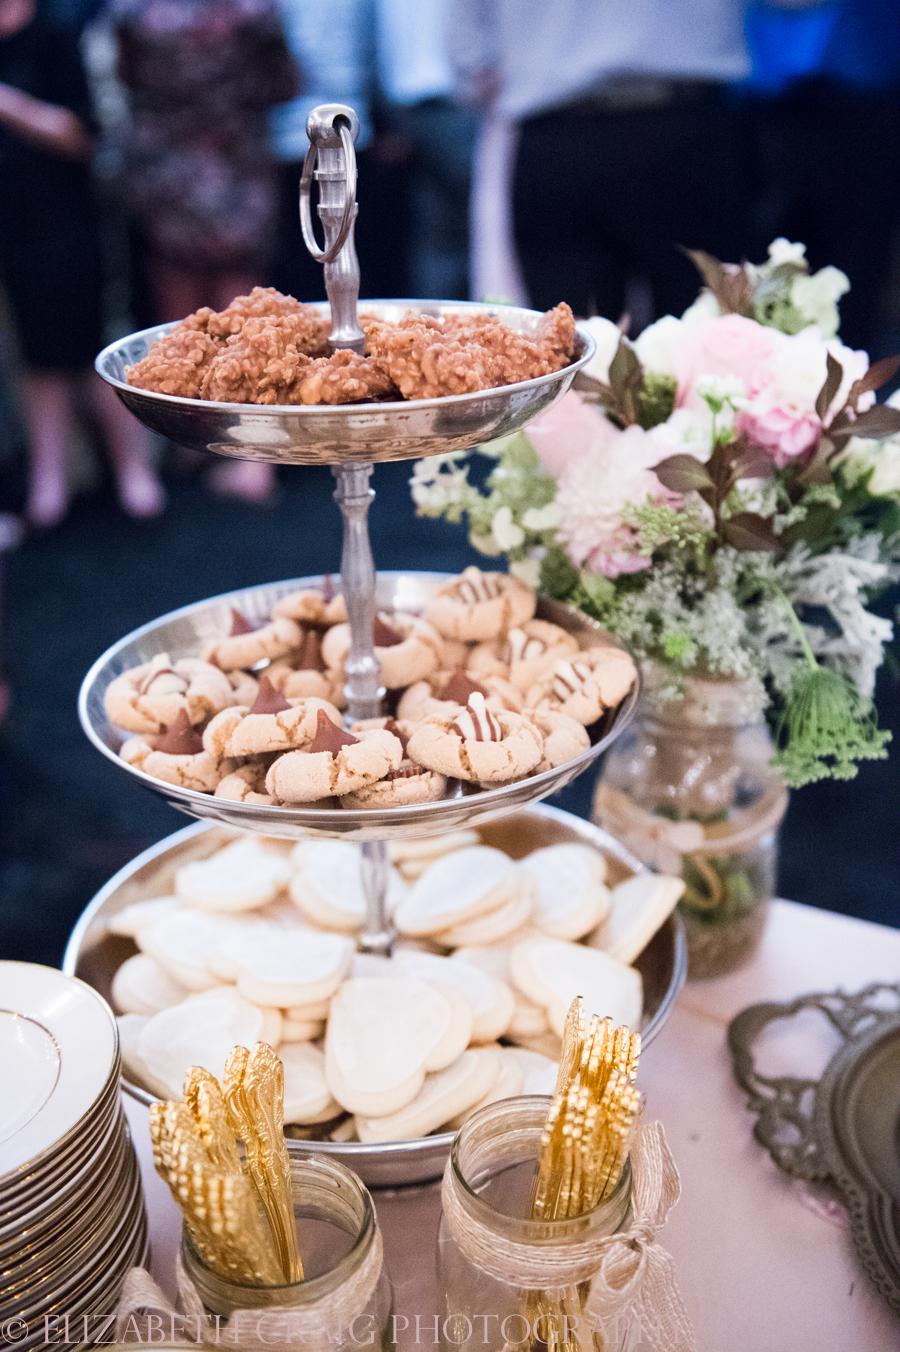 Dubois Brockway St. Marys PA Weddings-0236